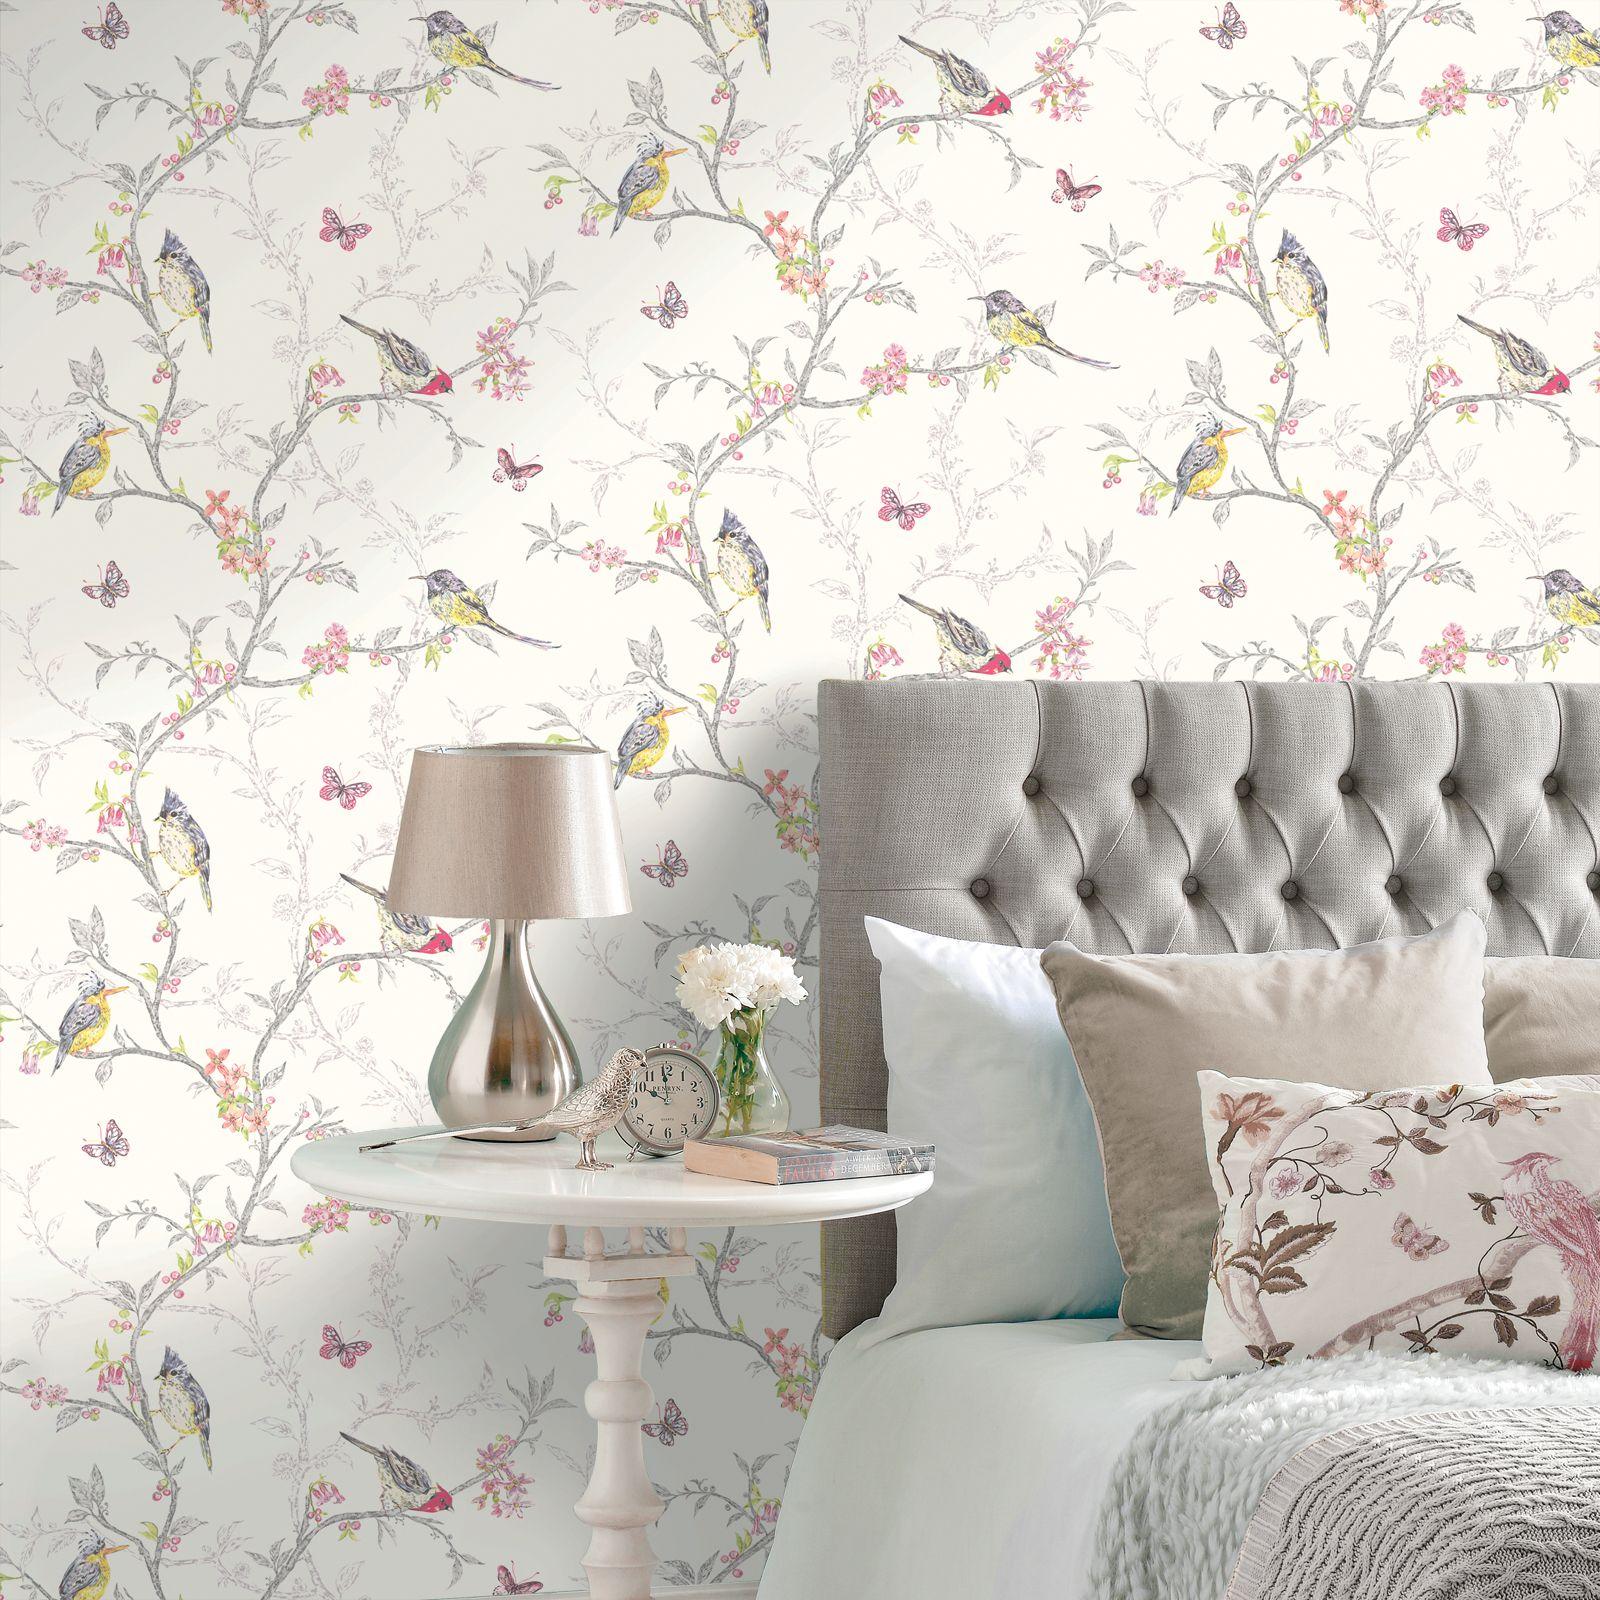 holden decor phoebe birds wallpaper - blue, pink, teal, grey, white